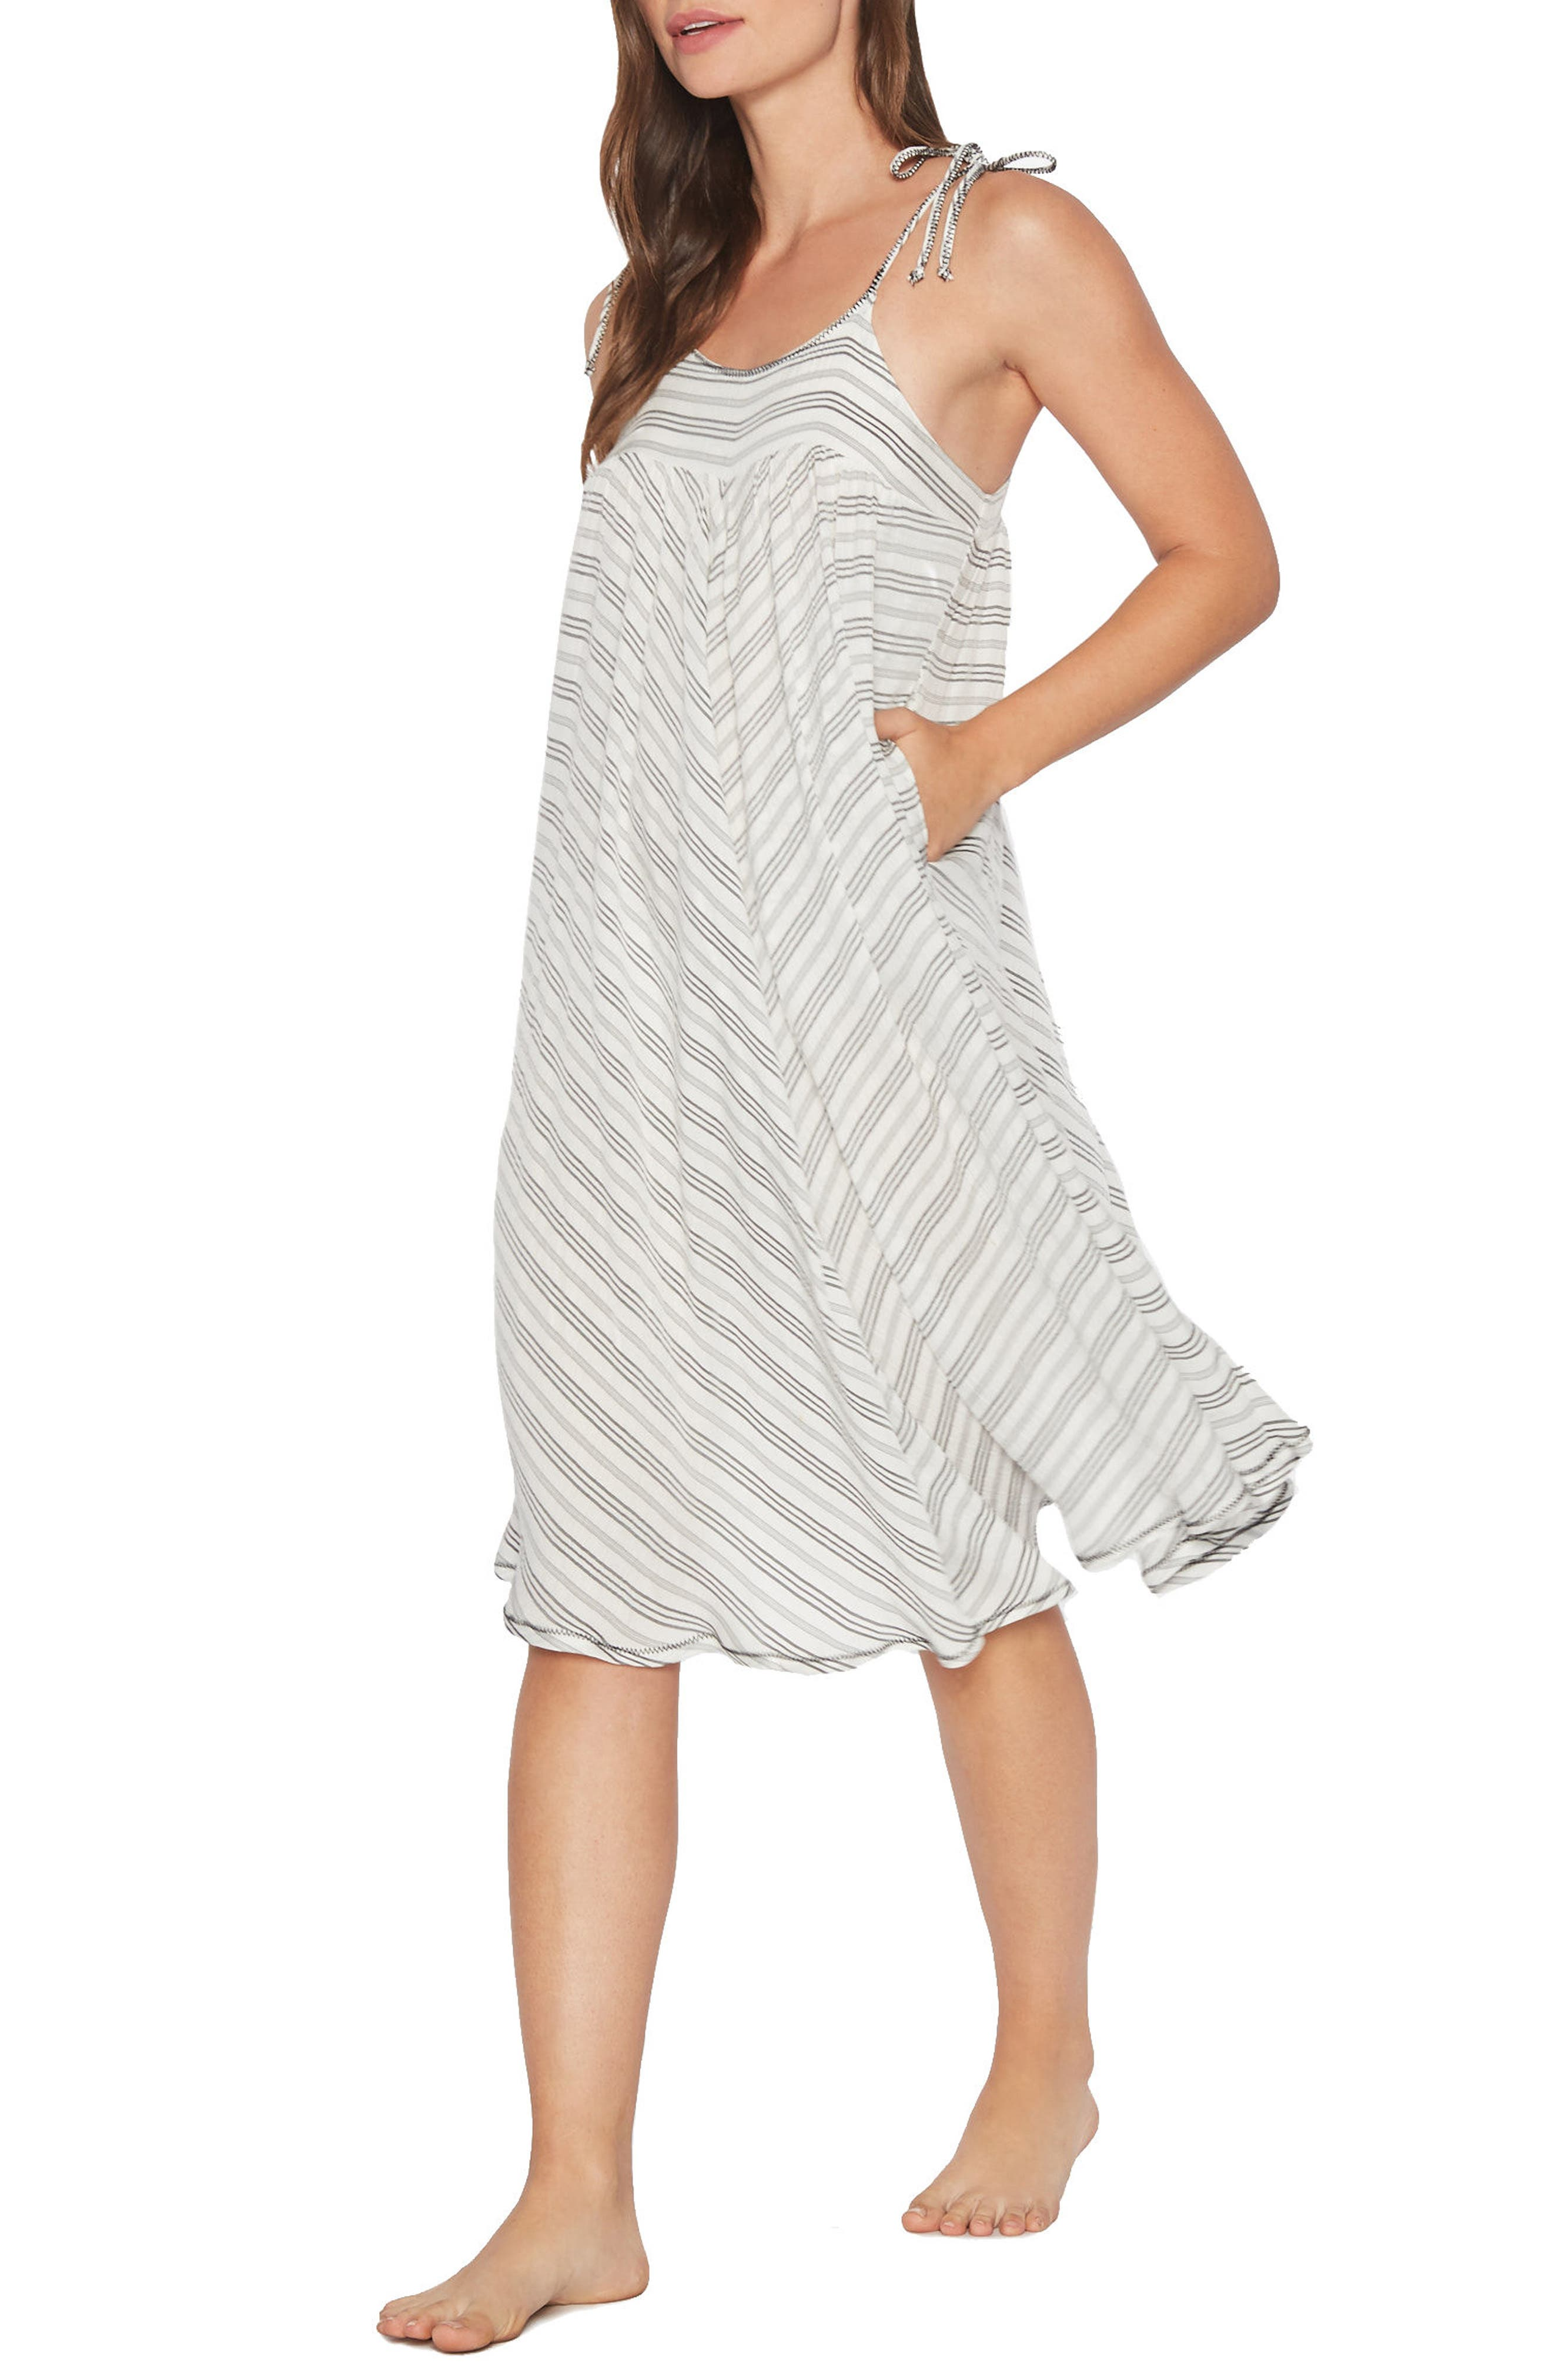 Norah Stripe Cover-Up Dress,                         Main,                         color, 023